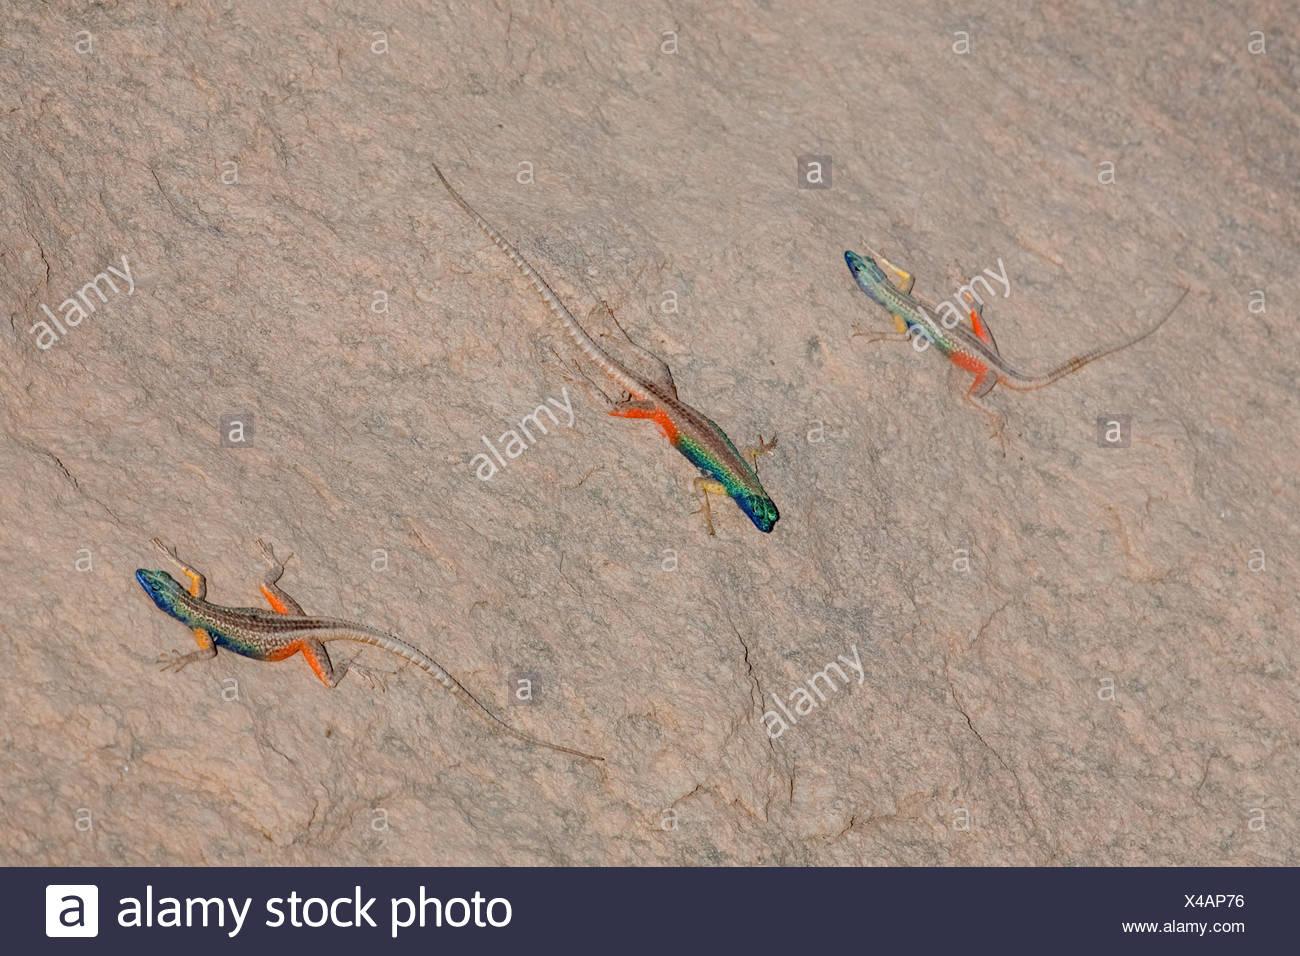 Broadley's Flat Lizard (Platysaurus broadleyi), three colourful males on a rock, South Africa, Northern Cape, Augrabies Falls-Nationalpark, Kakamas Stock Photo